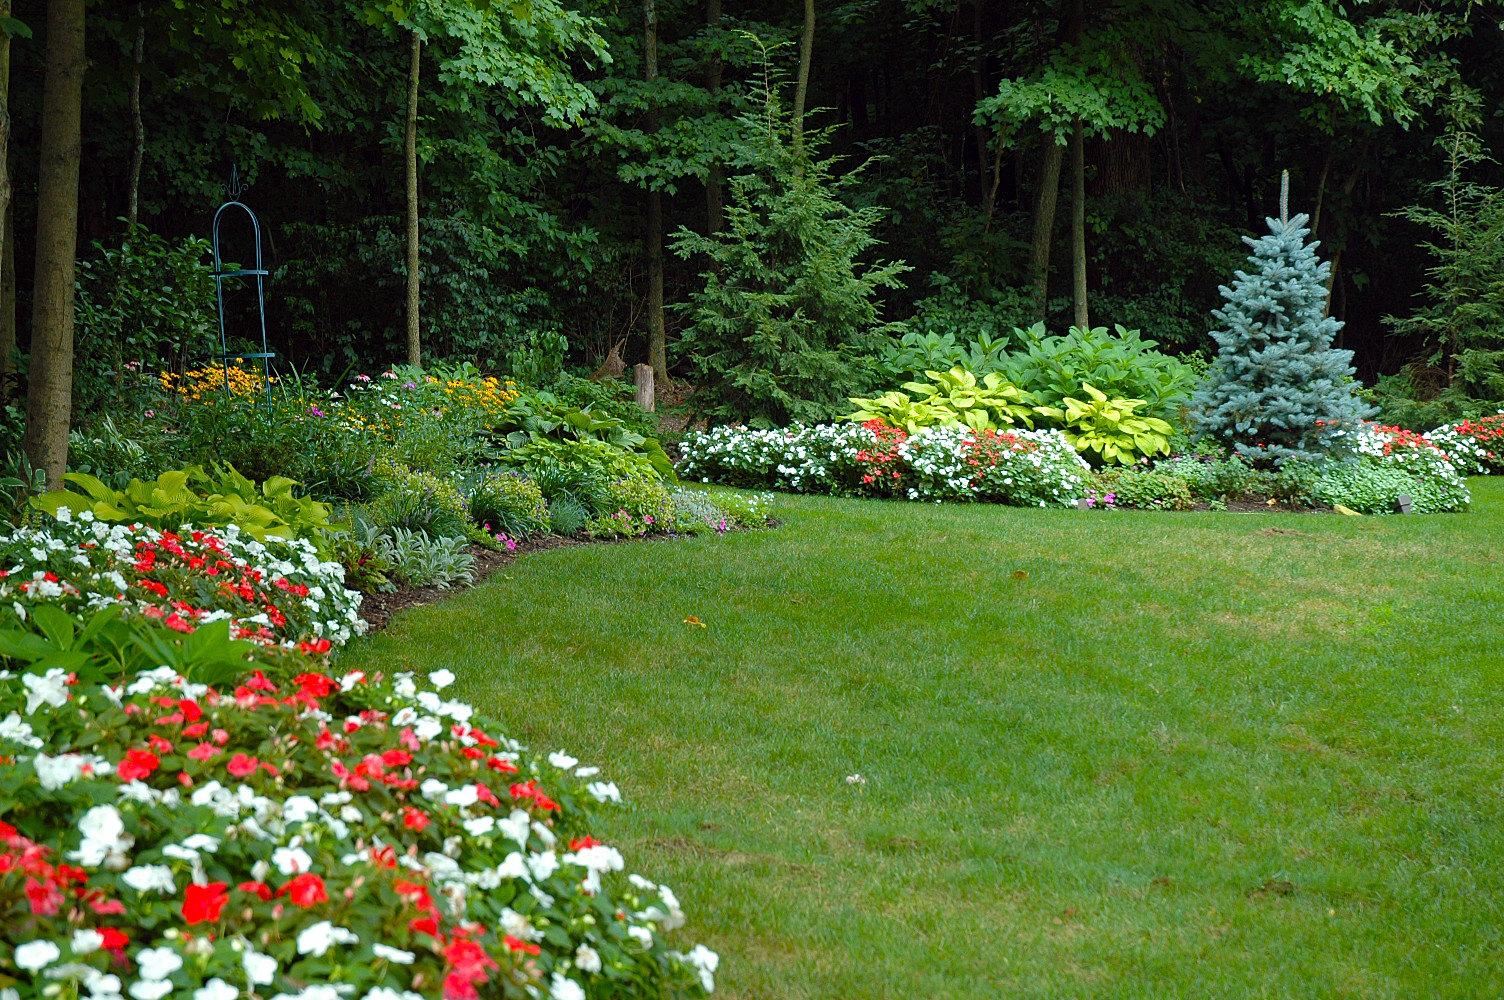 Lamond design woodland edge garden for Woodland garden design